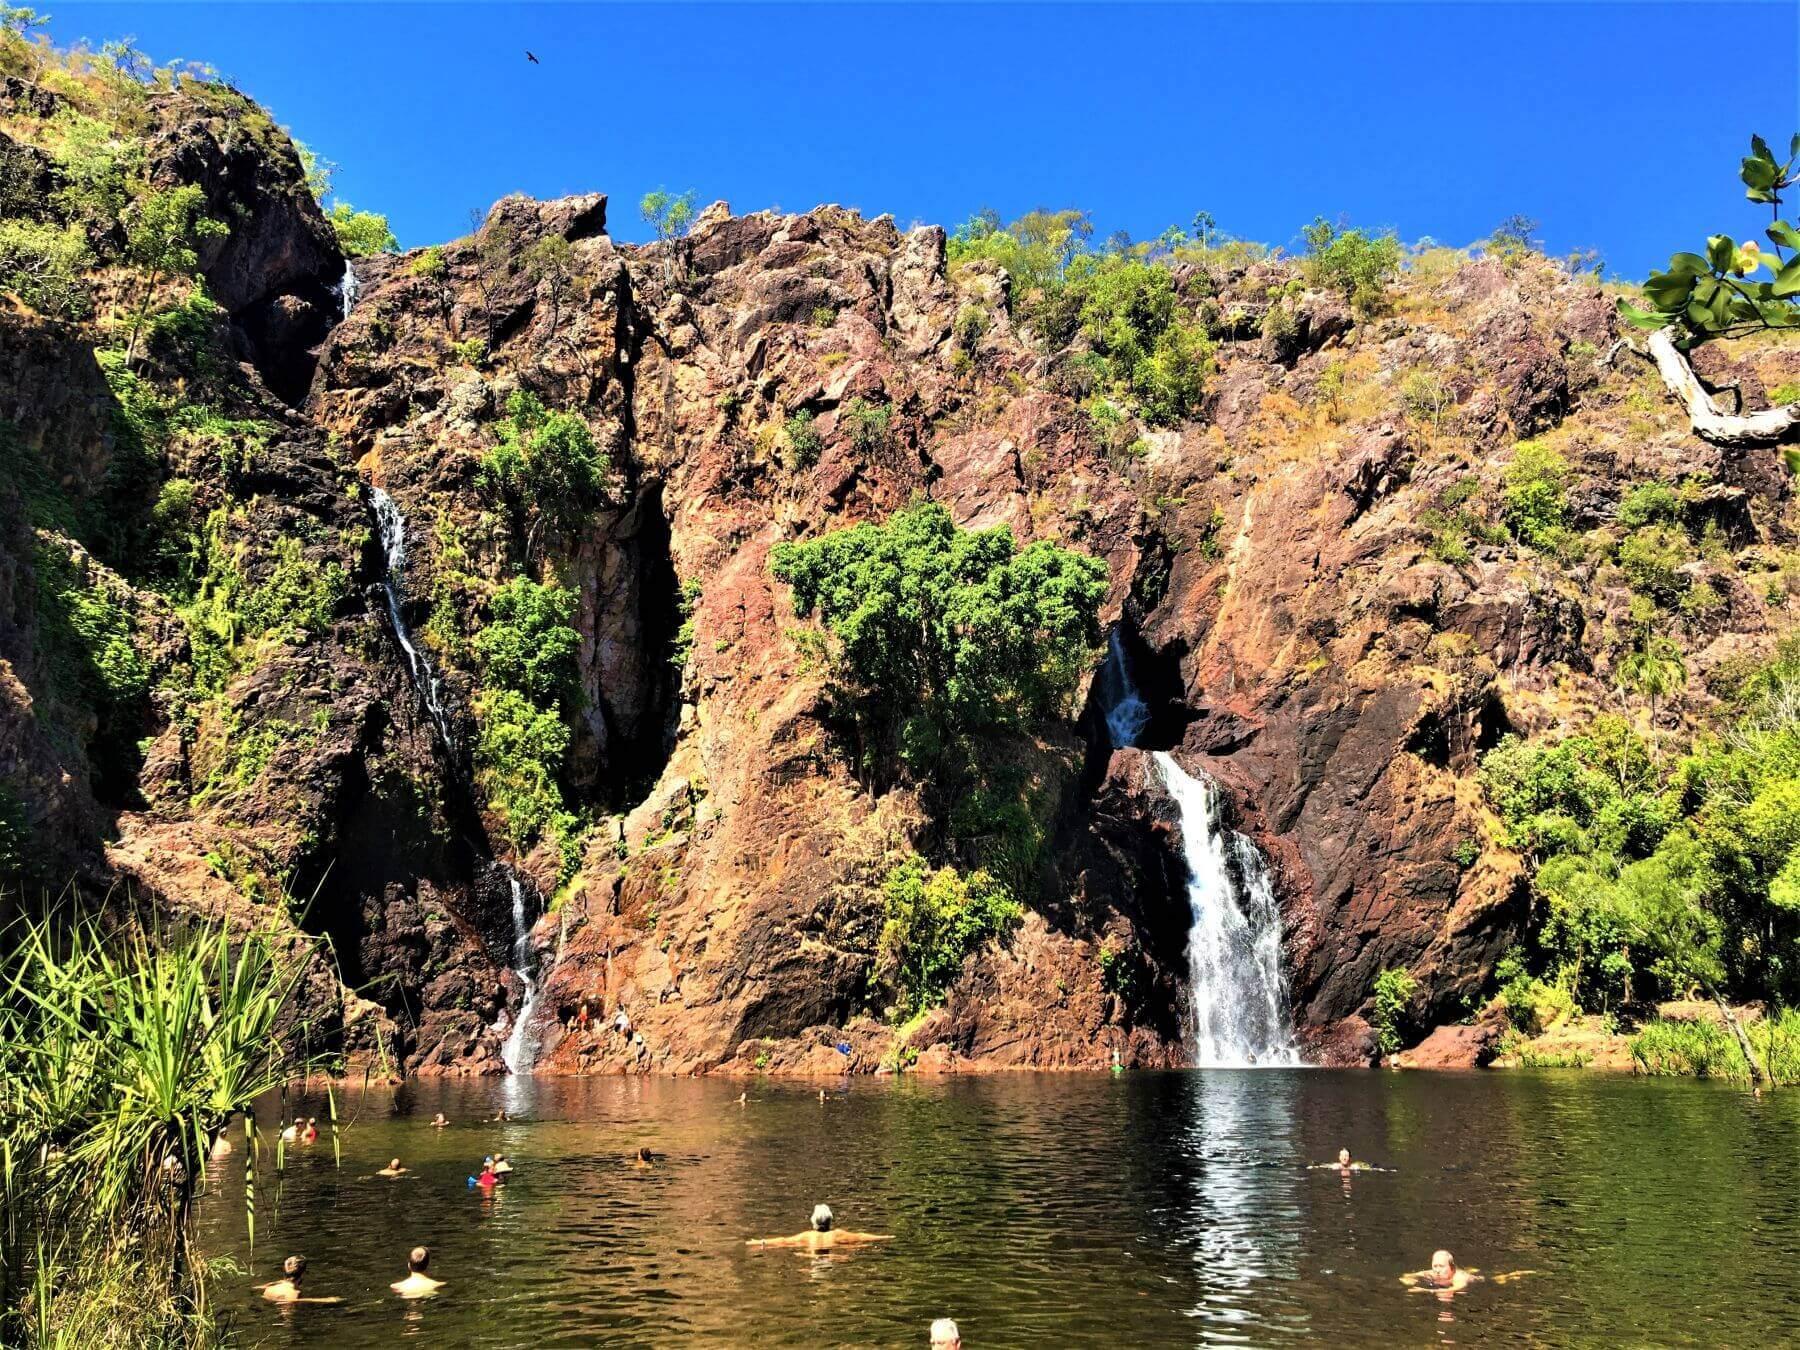 Schöner Wasserfall im Litchfield National Park - Wangi Falls